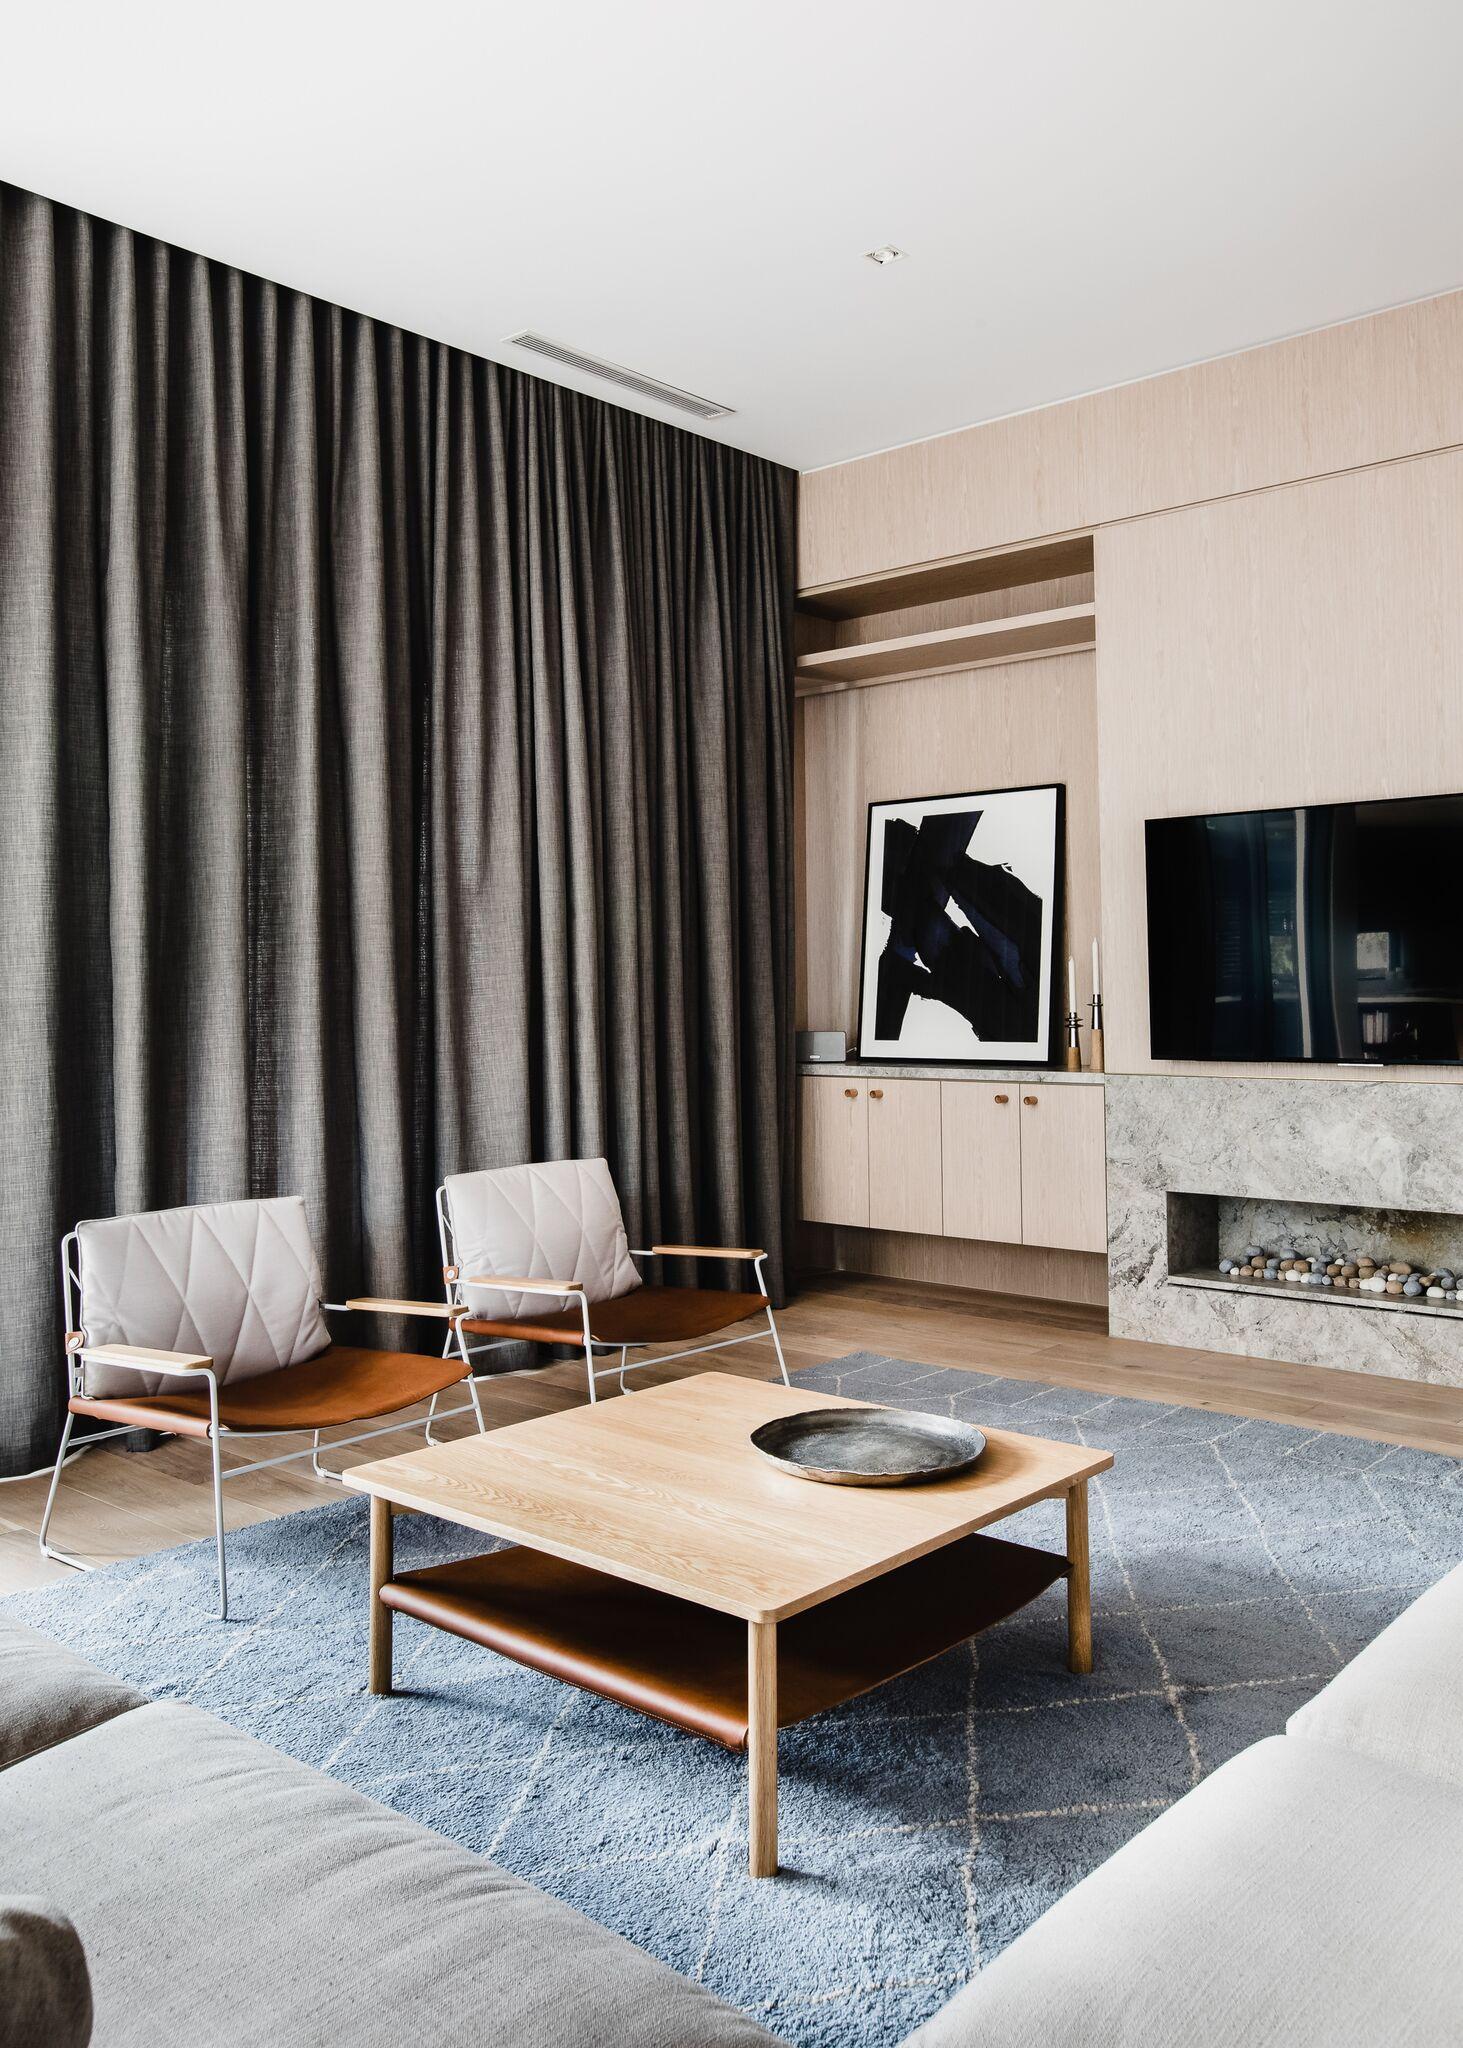 Gallery Of Balwyn Home By Studio Ezra Local Australian Residential Styling And Bespoke Design Balwyn, Melbourne Image 28